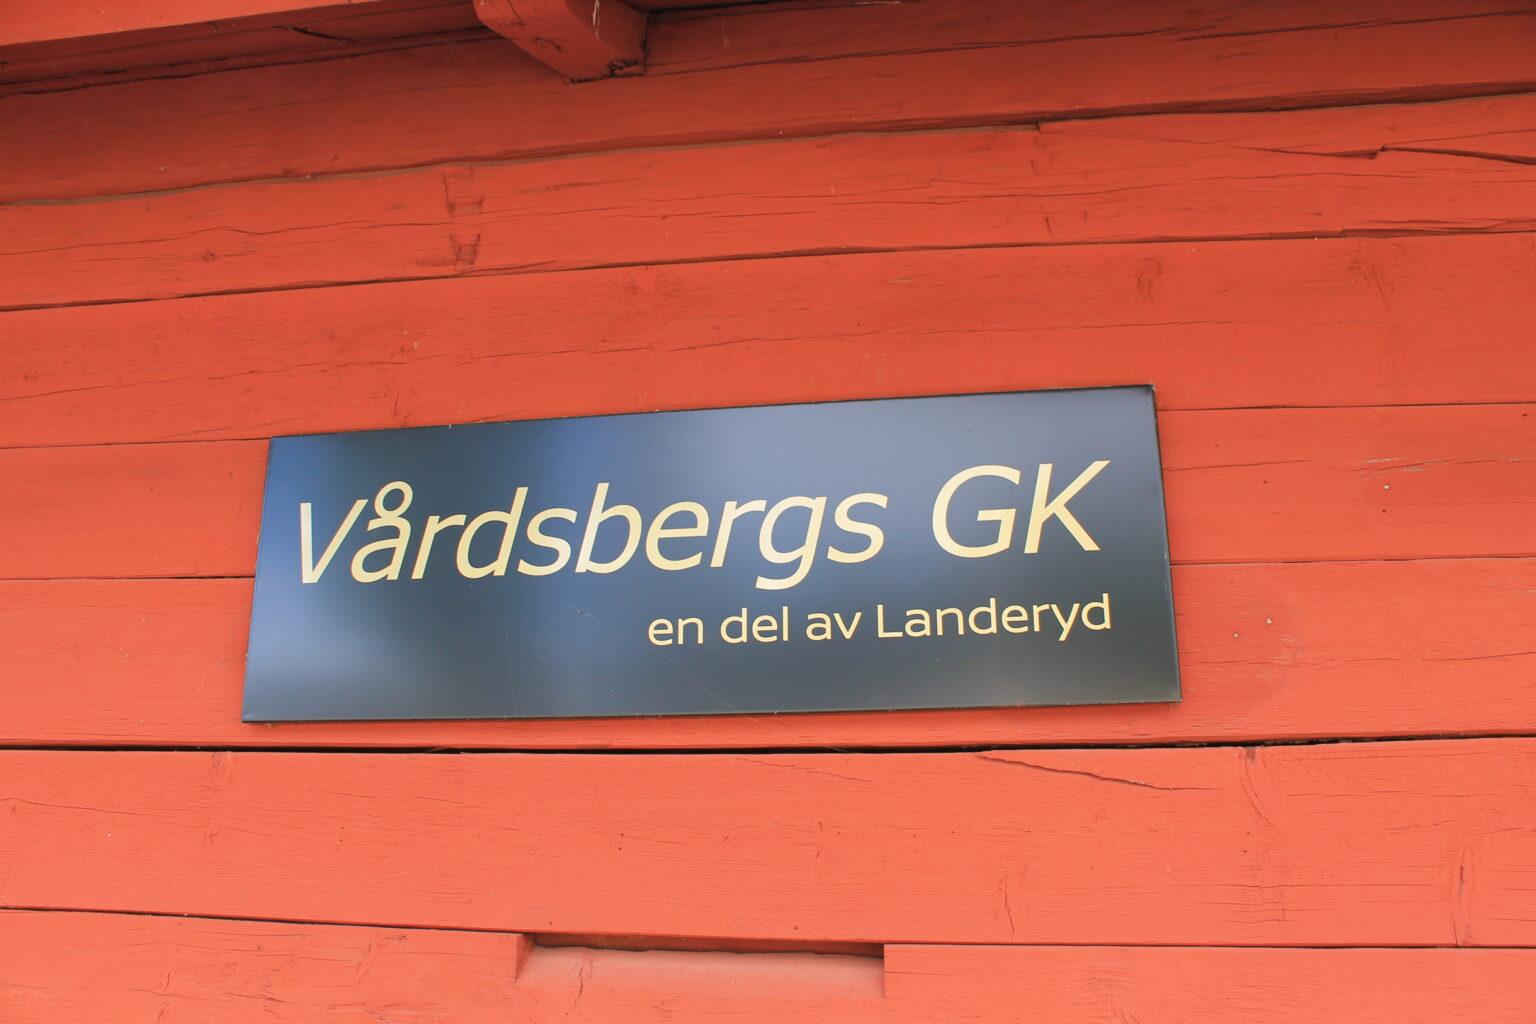 Vårdsbergs GK